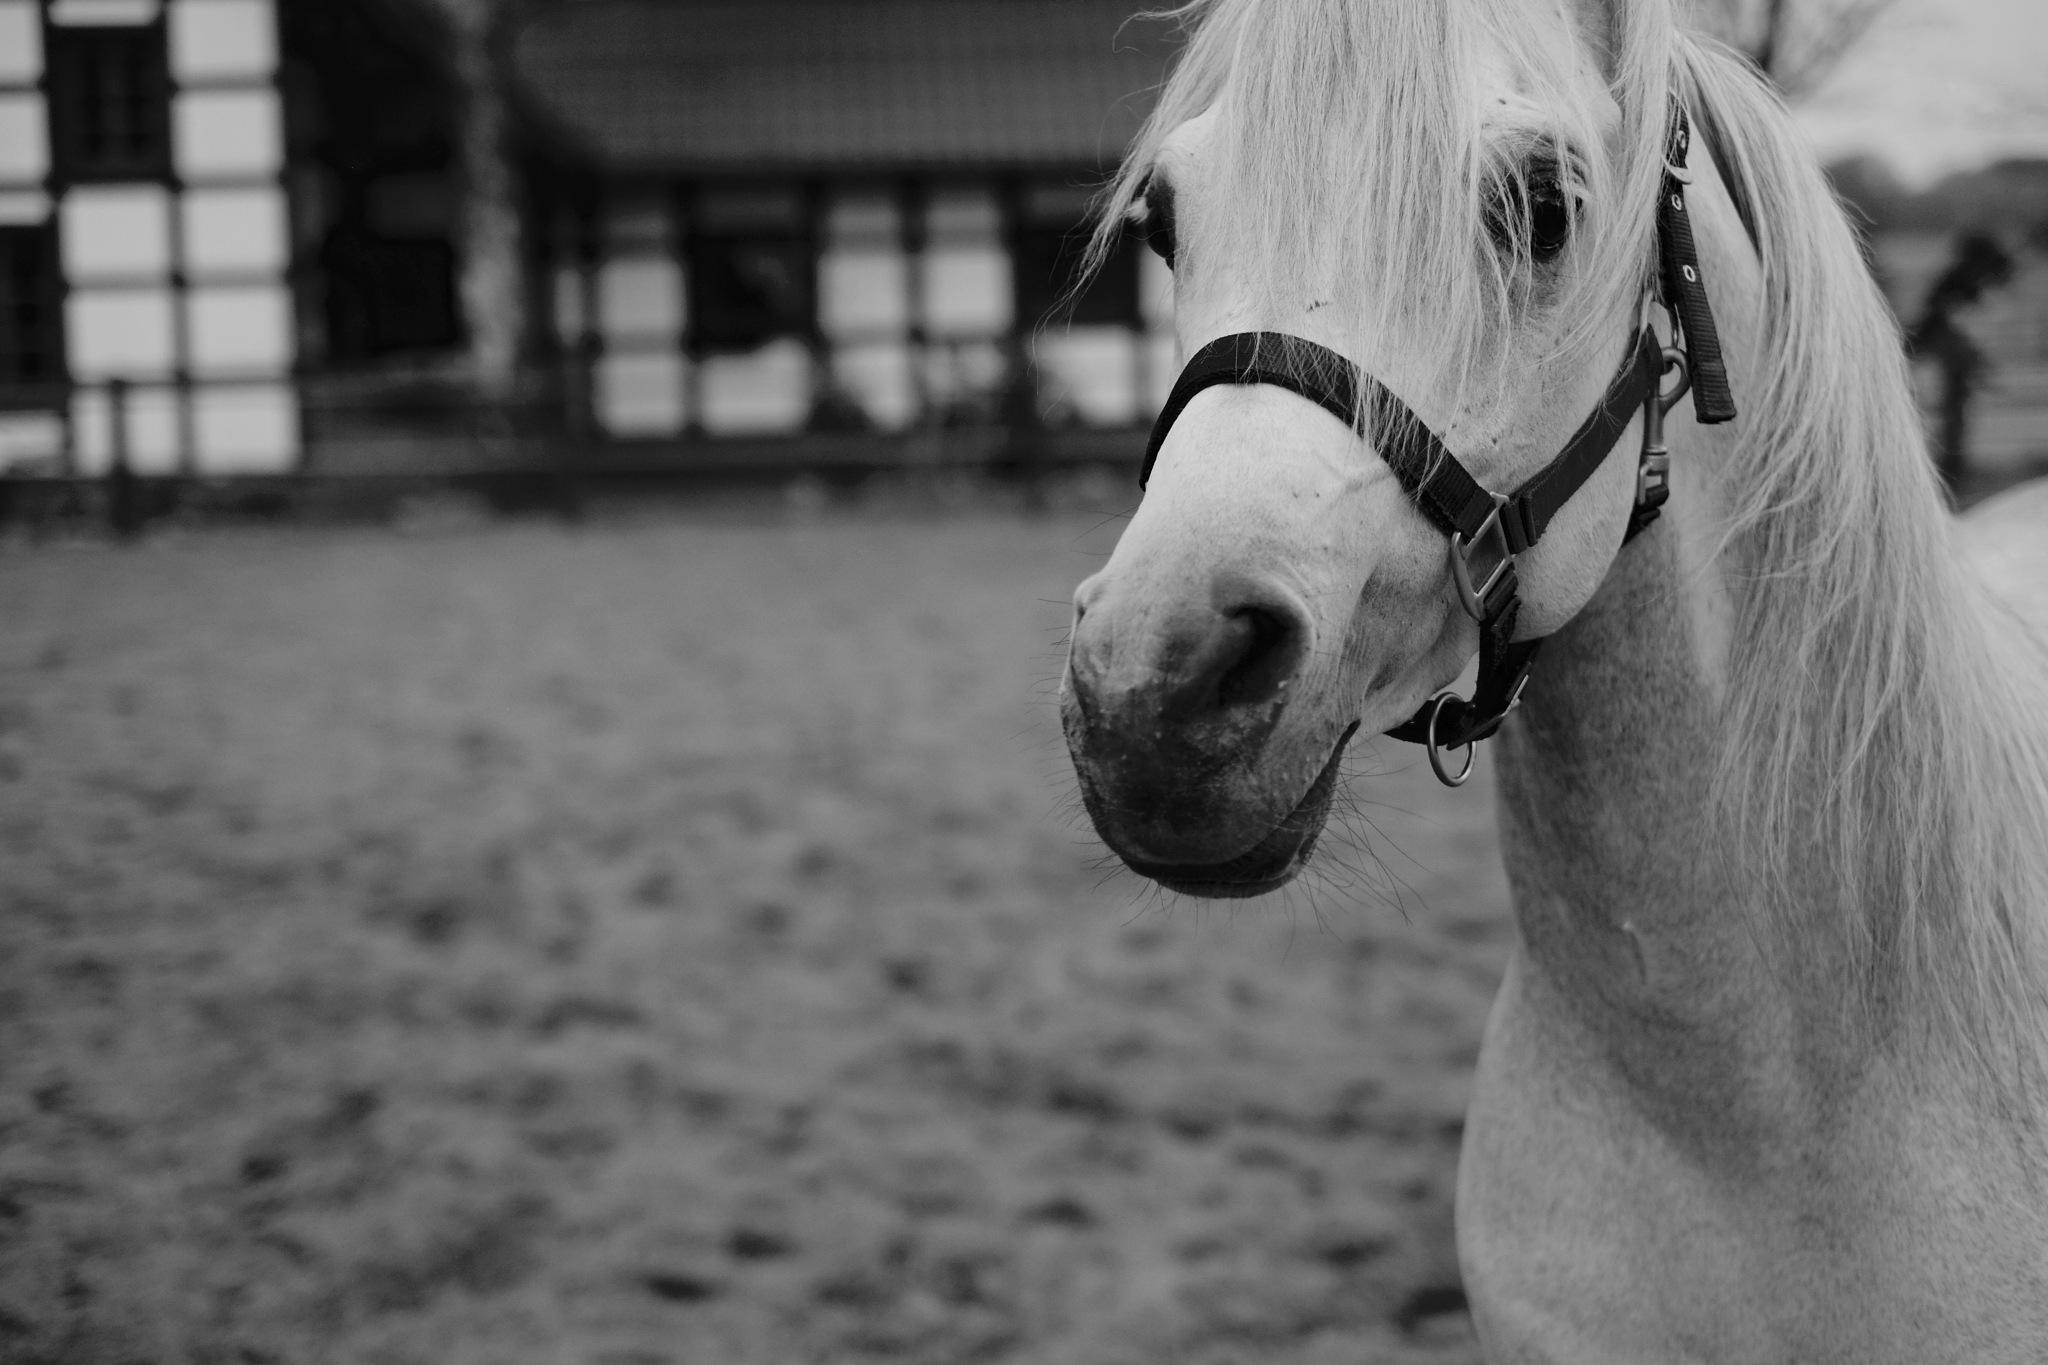 White Horse by peterkryzun